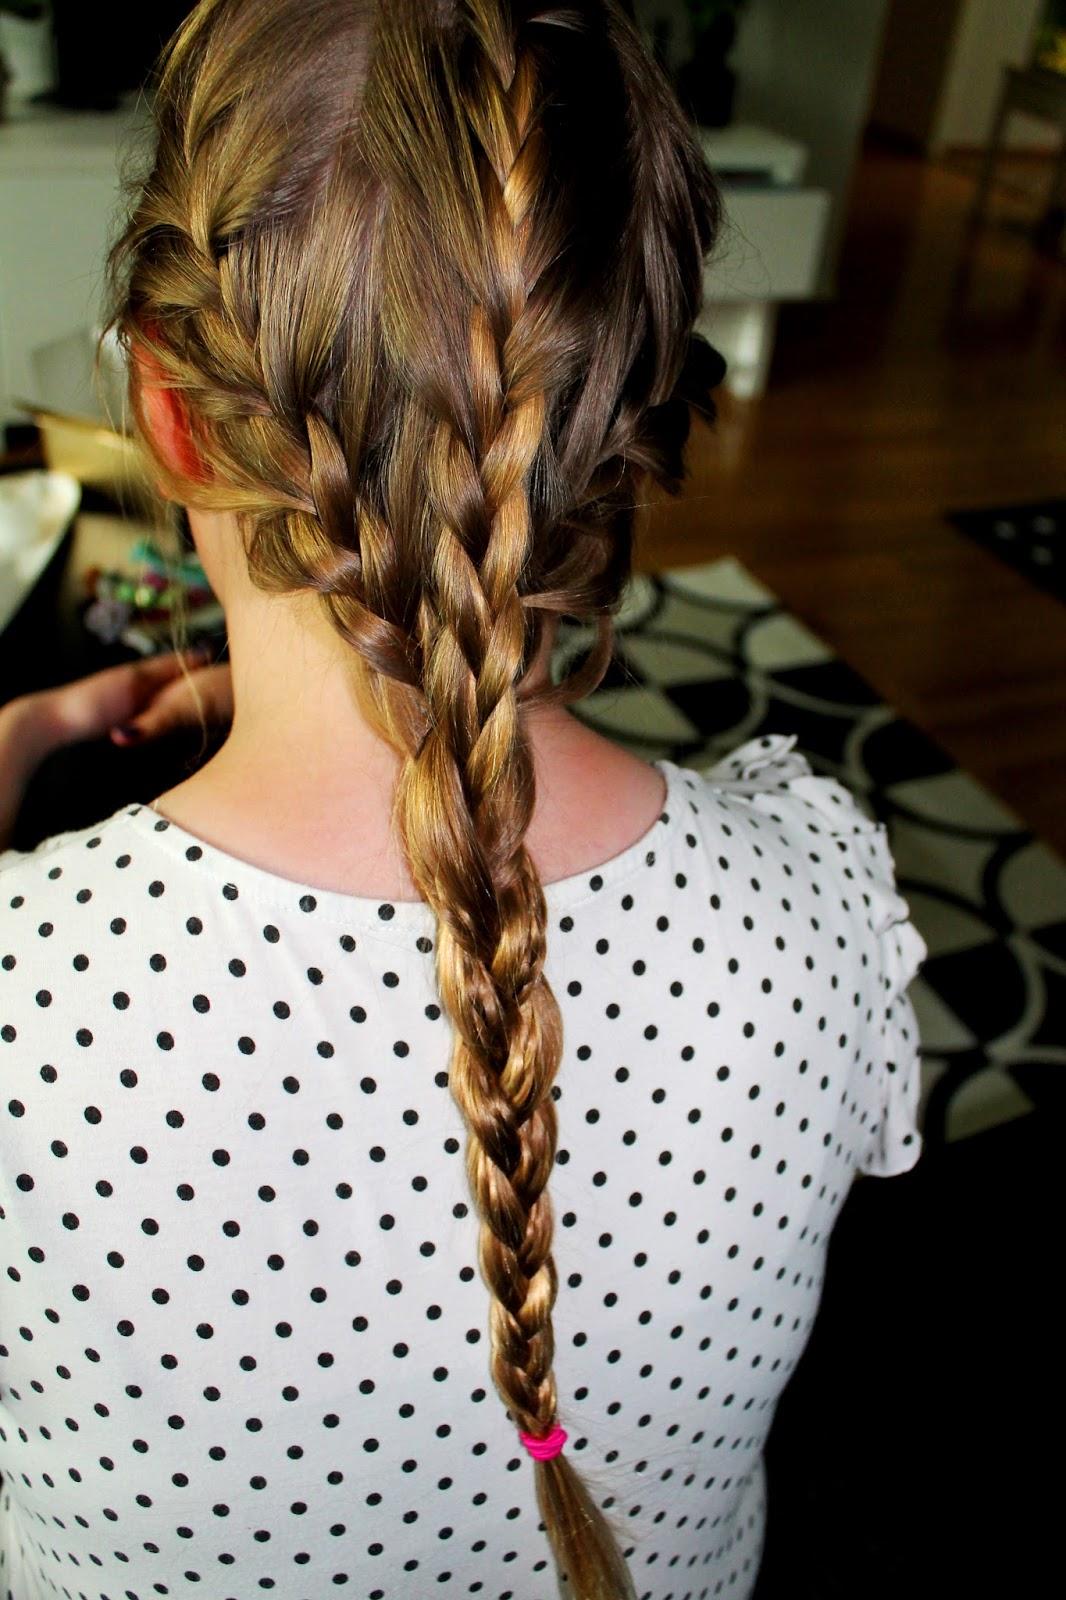 Rapunzel hair | Alinan kotona blog